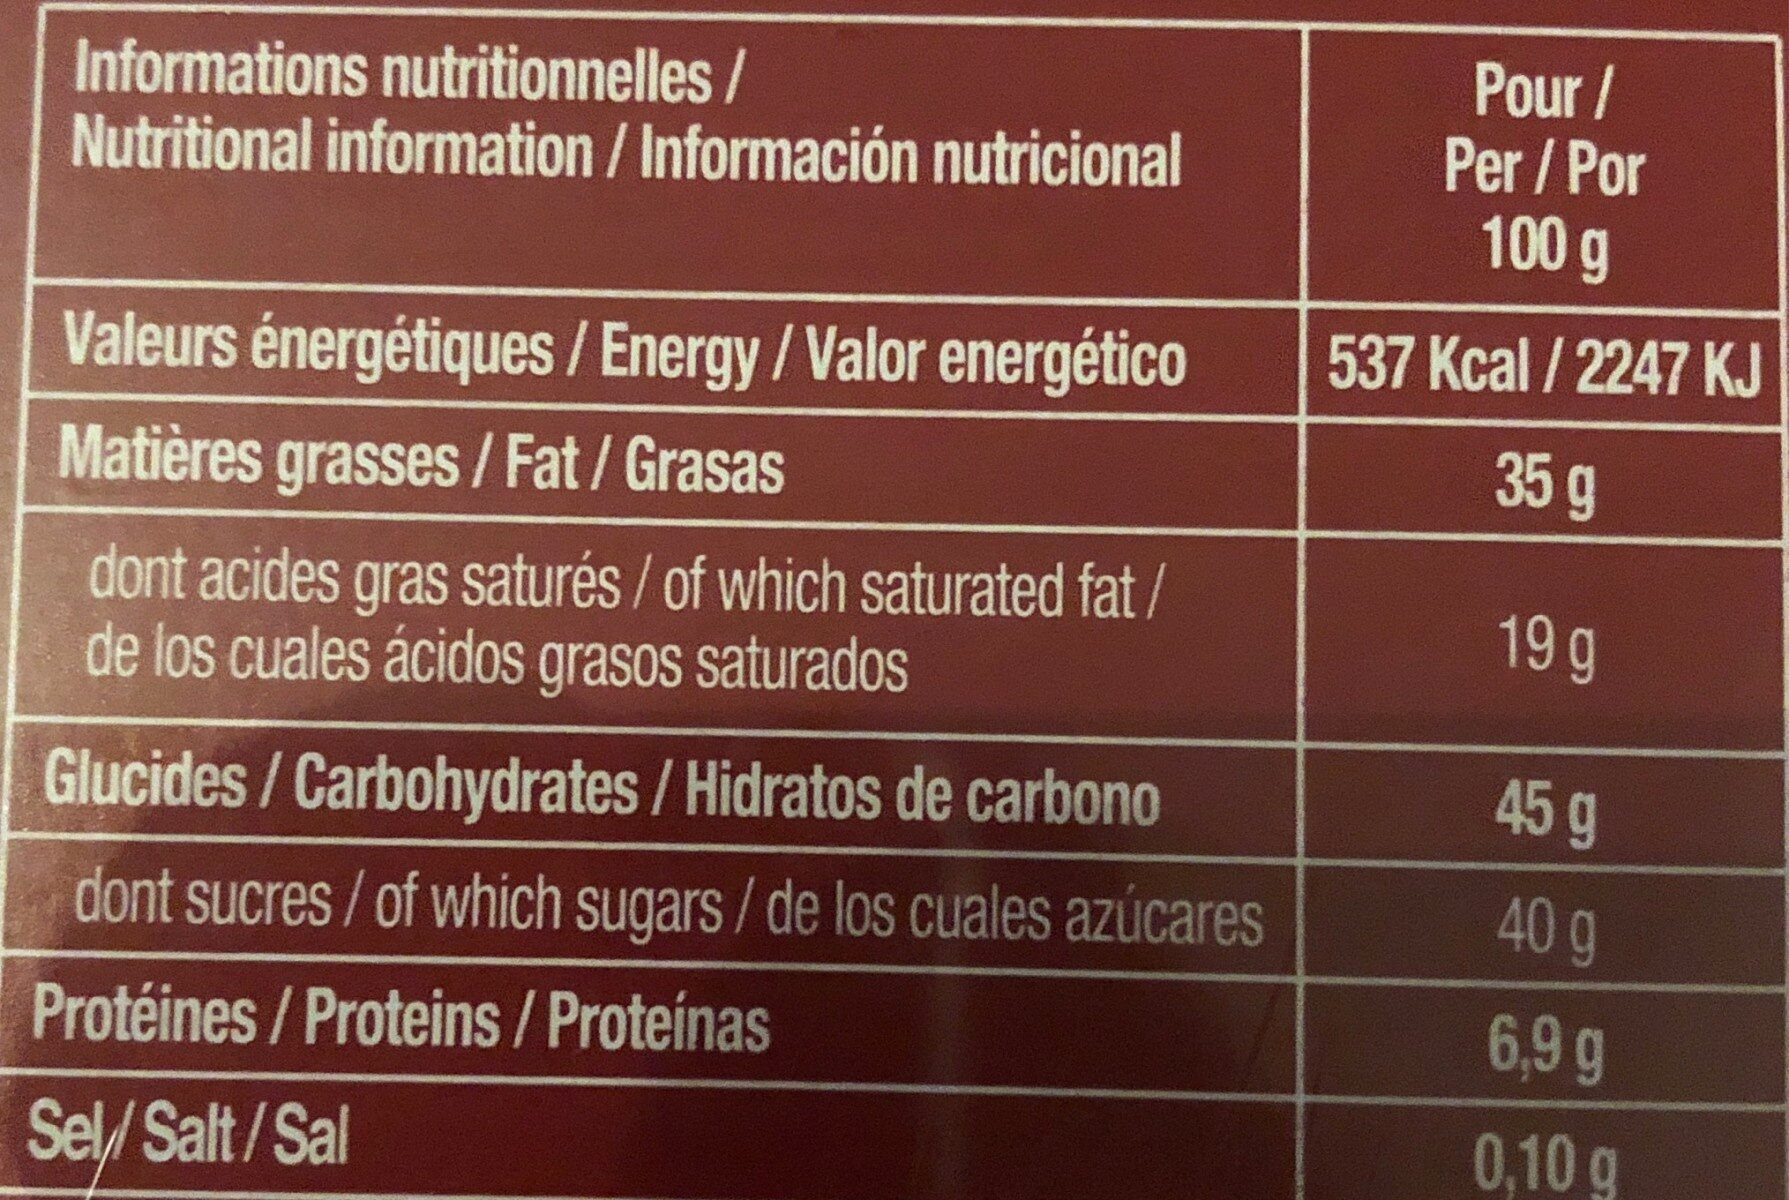 Chocolats assortis - Nutrition facts - fr